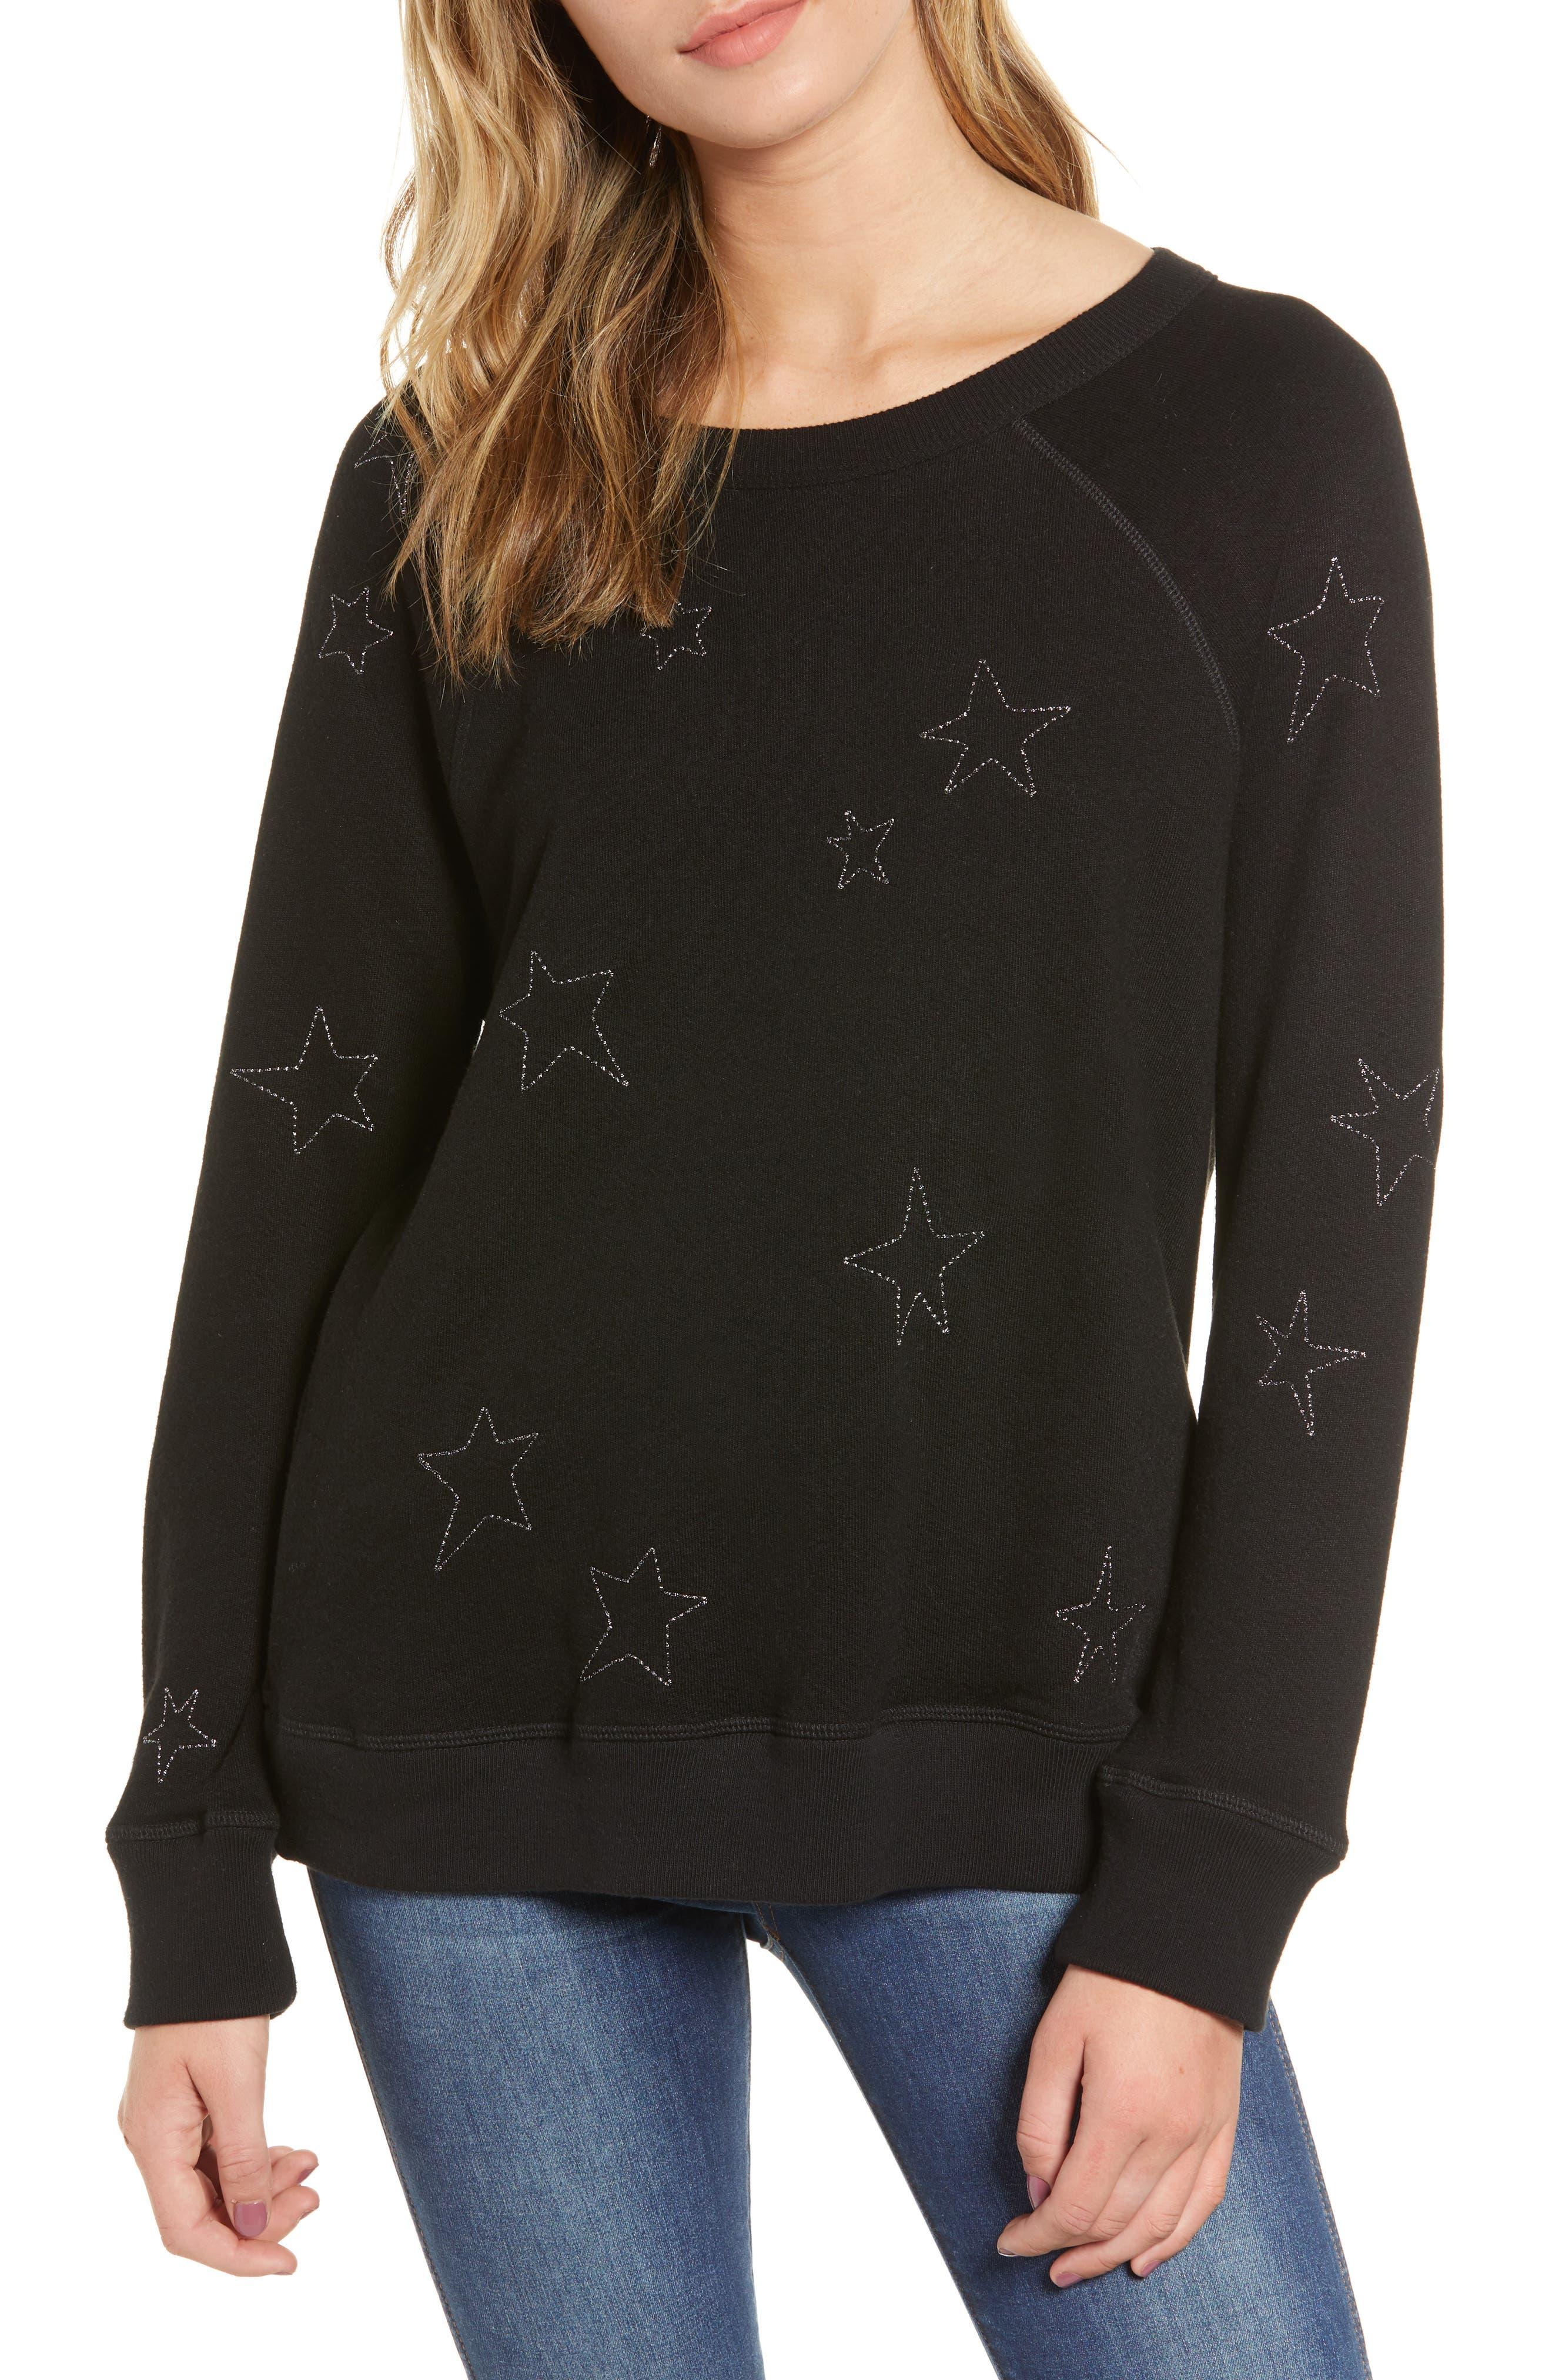 N:PHILANTHROPY Montreal Sweatshirt in Black Cat Stars